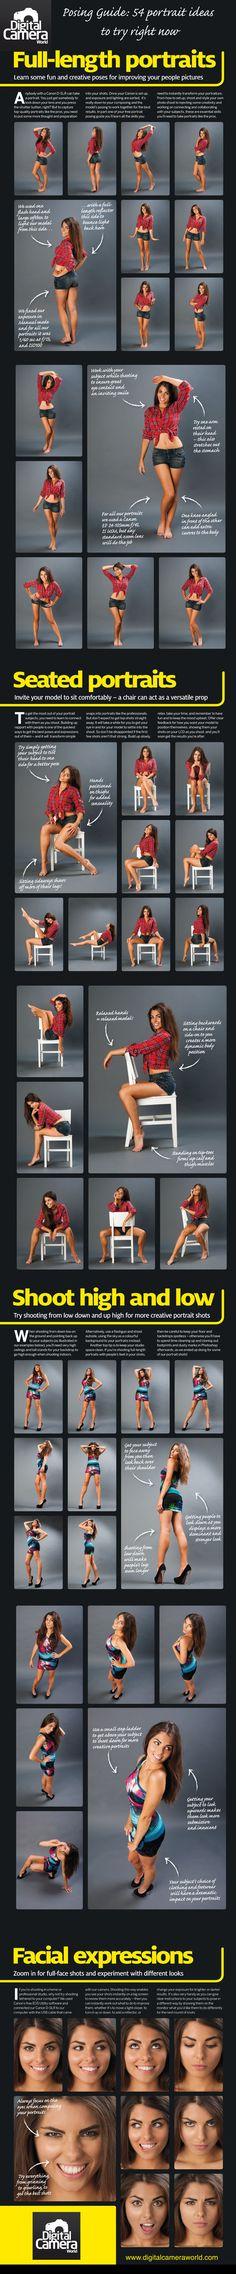 Photography Cheatsheets - Posing Guide & Facial Expressions